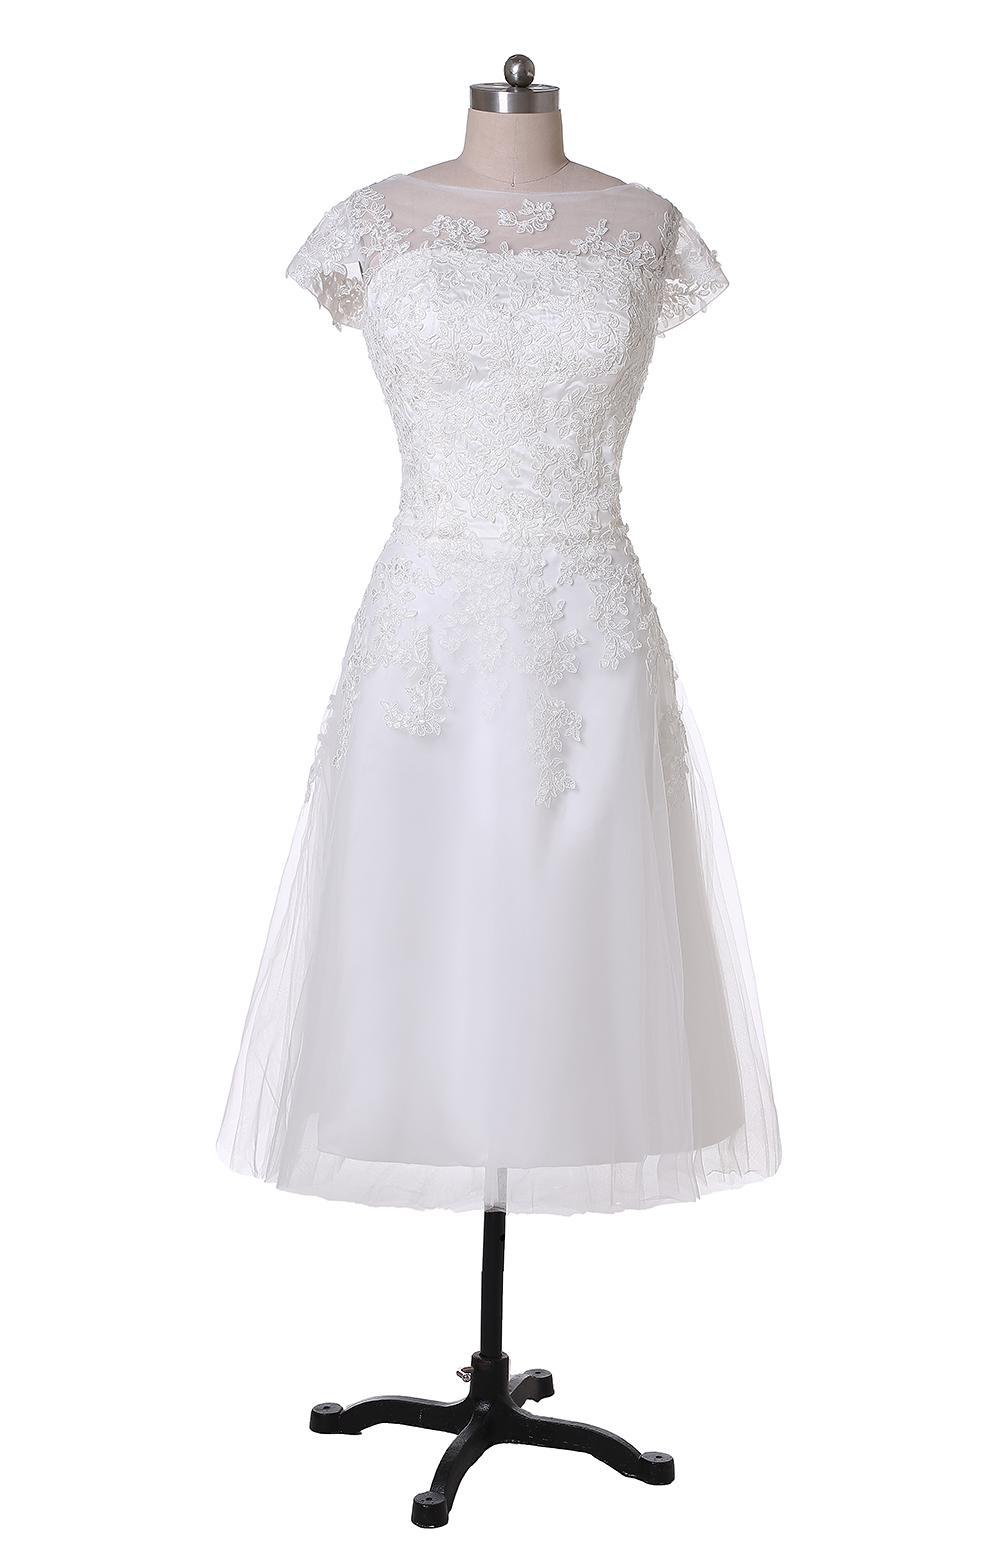 New Simple Tea Length Wedding Dresses Cap Sleeve Jewel Neck Lace Tulle A-Line Short Bridal Gowns Zipper Back Custom Made W1008